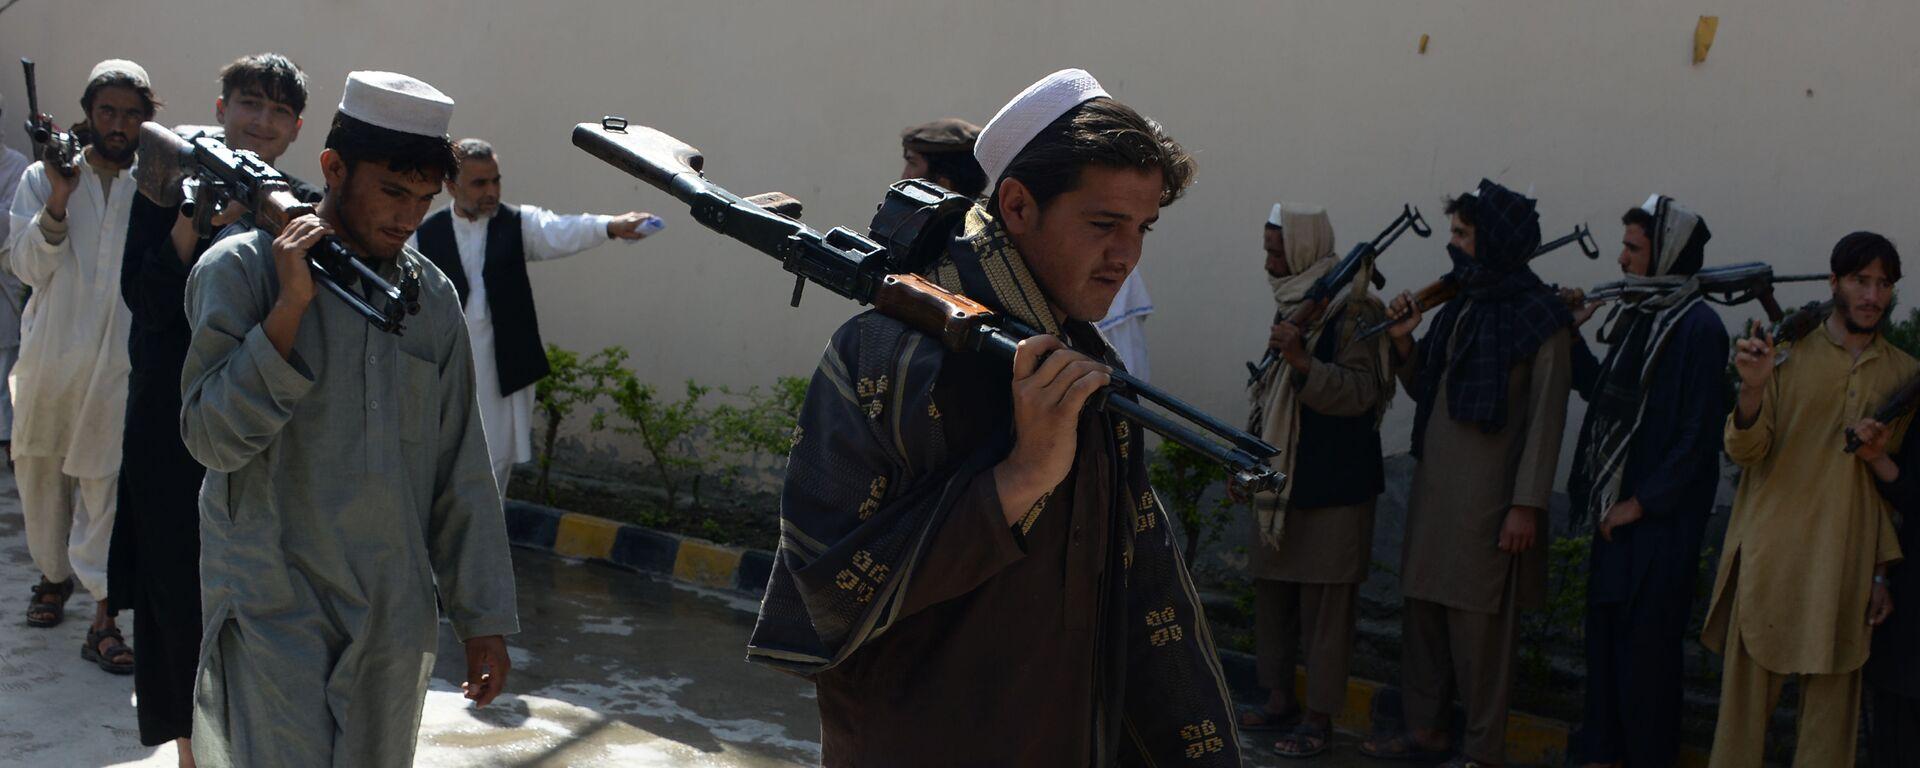 Talibanes afganos (archivo) - Sputnik Mundo, 1920, 02.08.2021